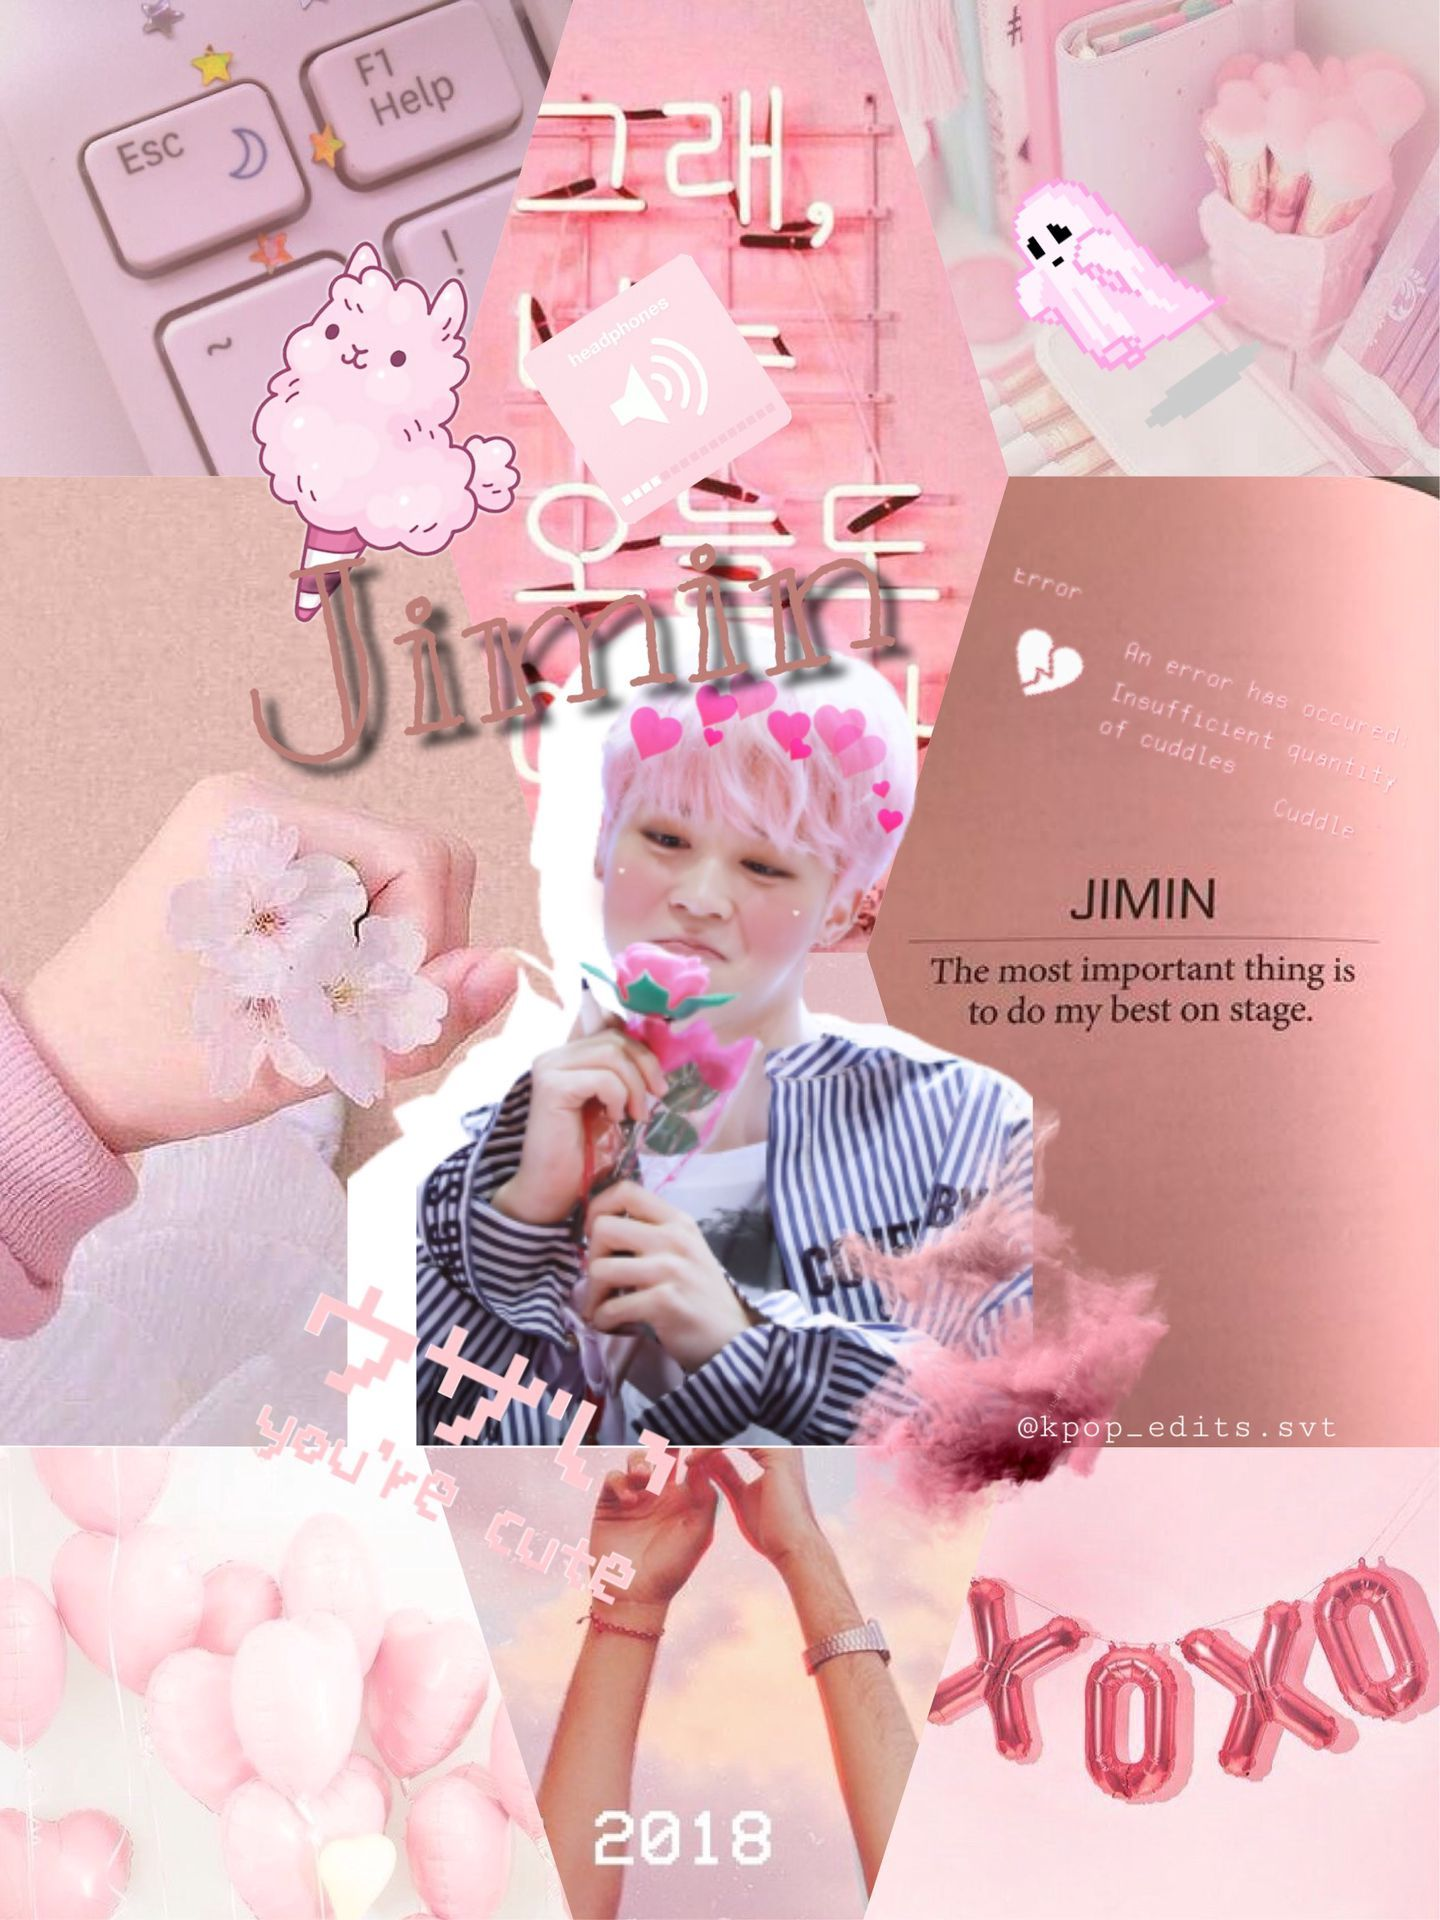 Pastel wallpapers free hd download 500 hq unsplash. Jimin Aesthetic Pink Wallpapers - Wallpaper Cave